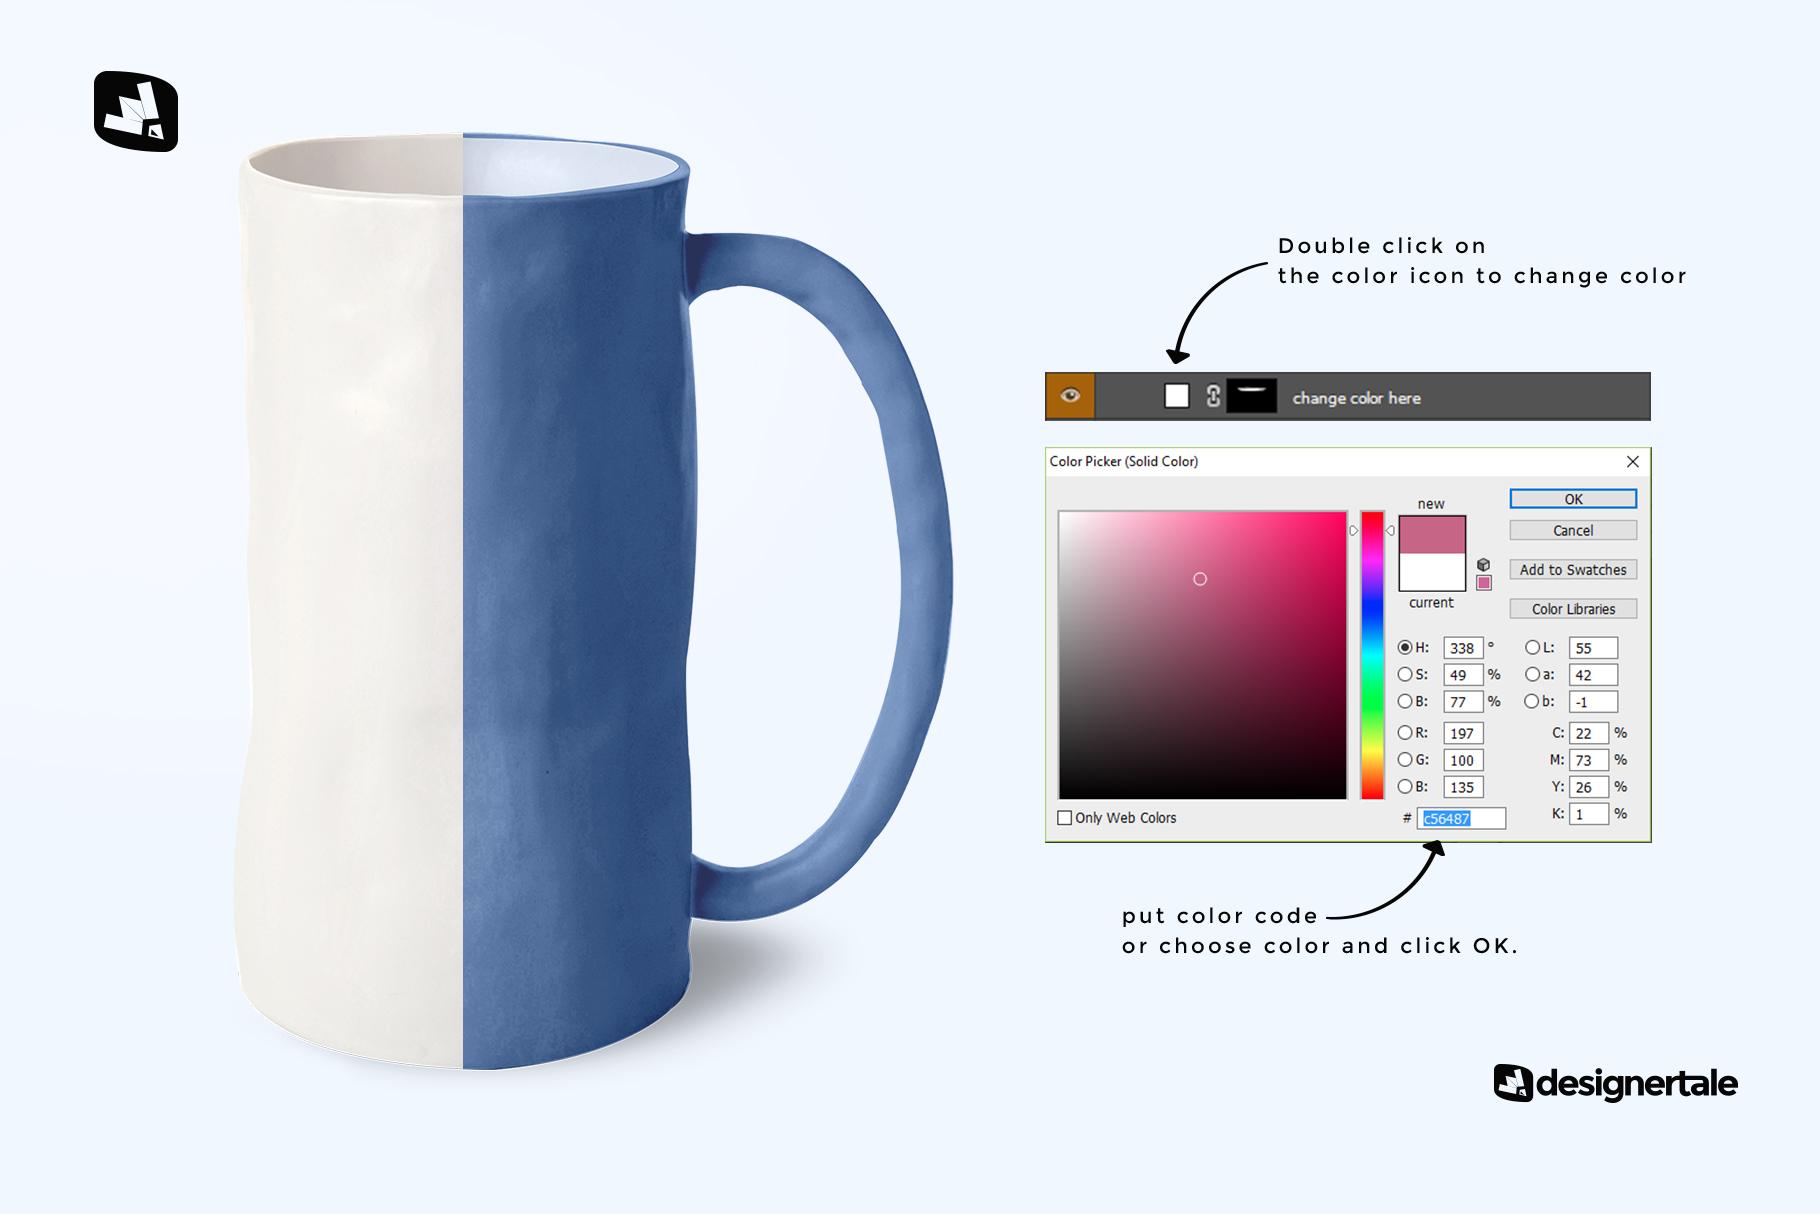 how to change color of the ceramic jug set mockup